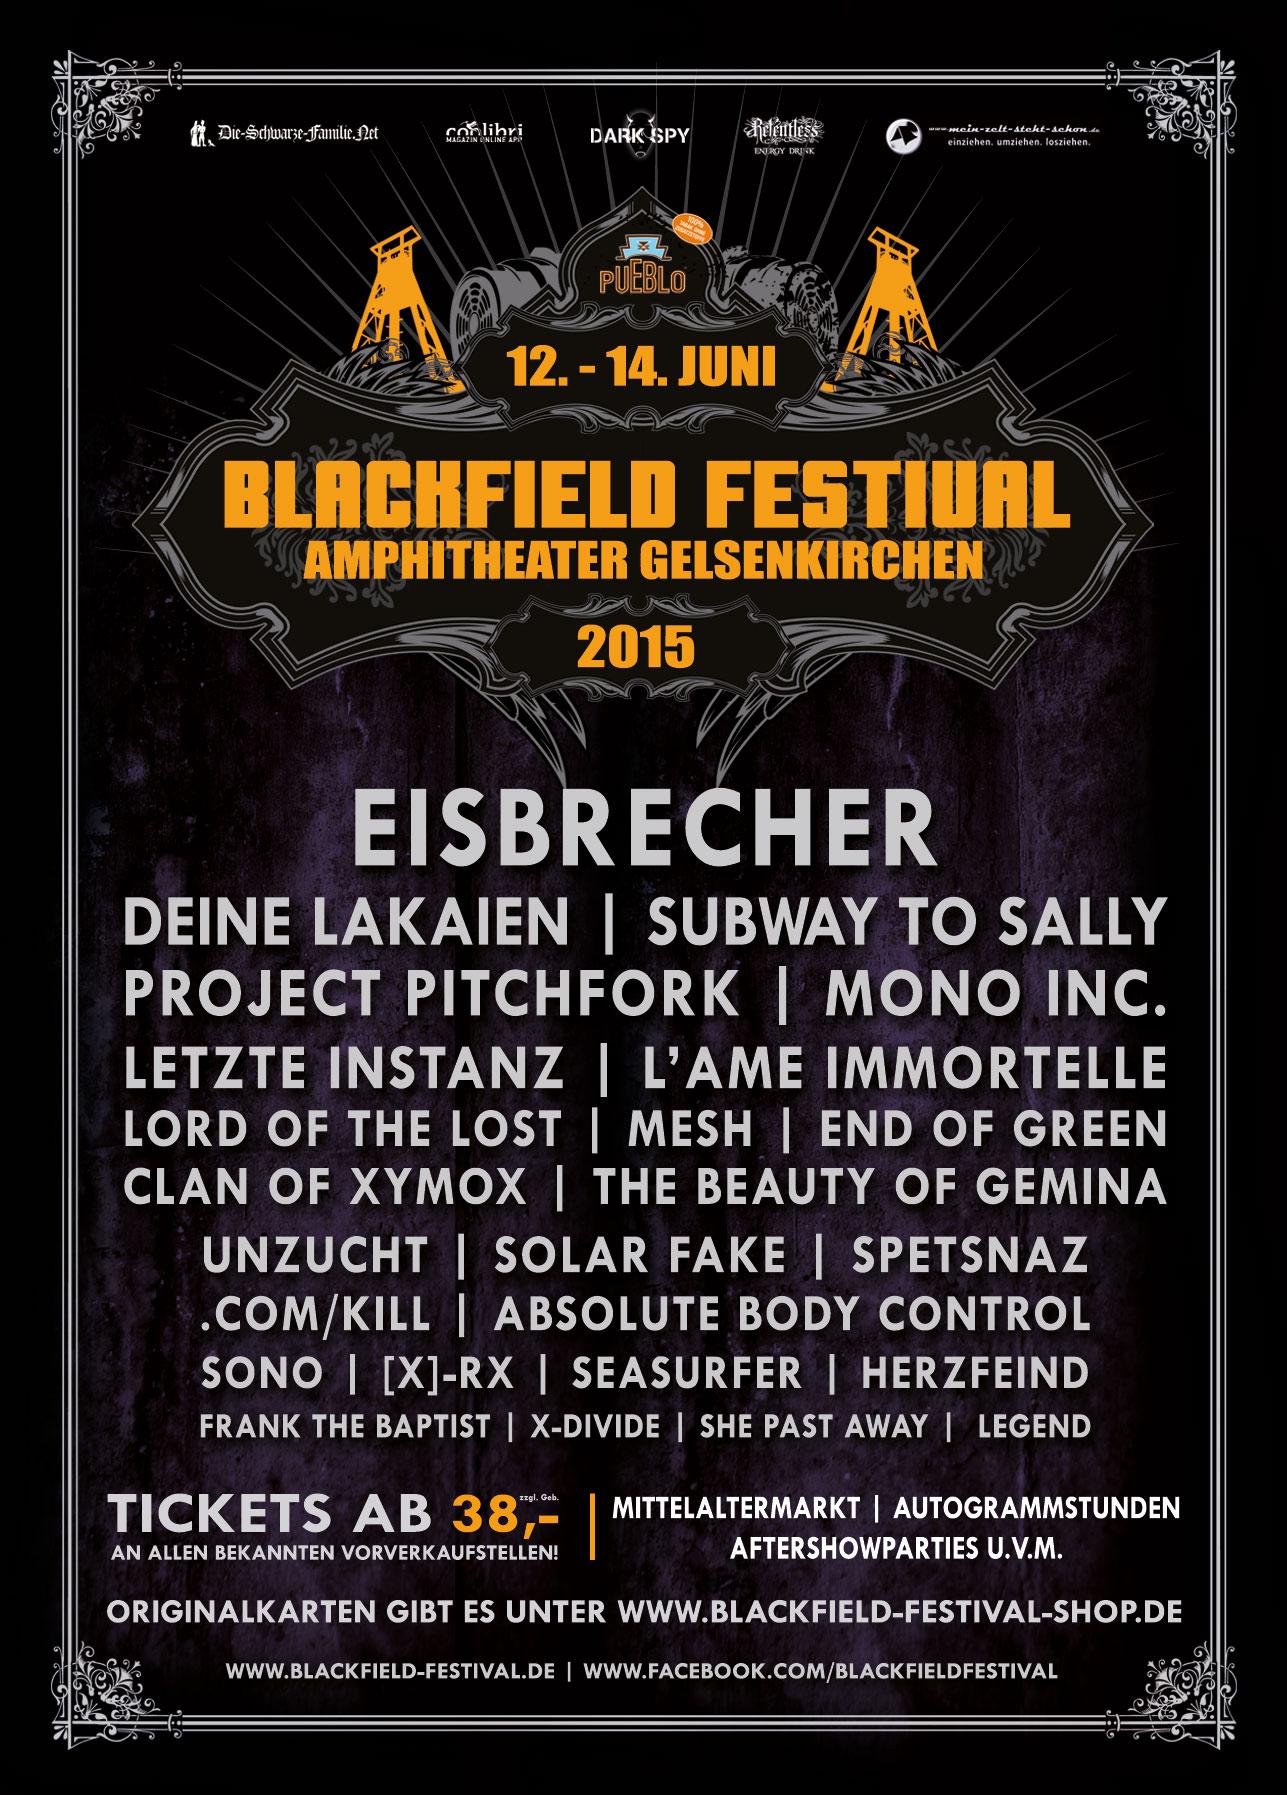 Blackfield-Festival 2015 zum letzten Mal?